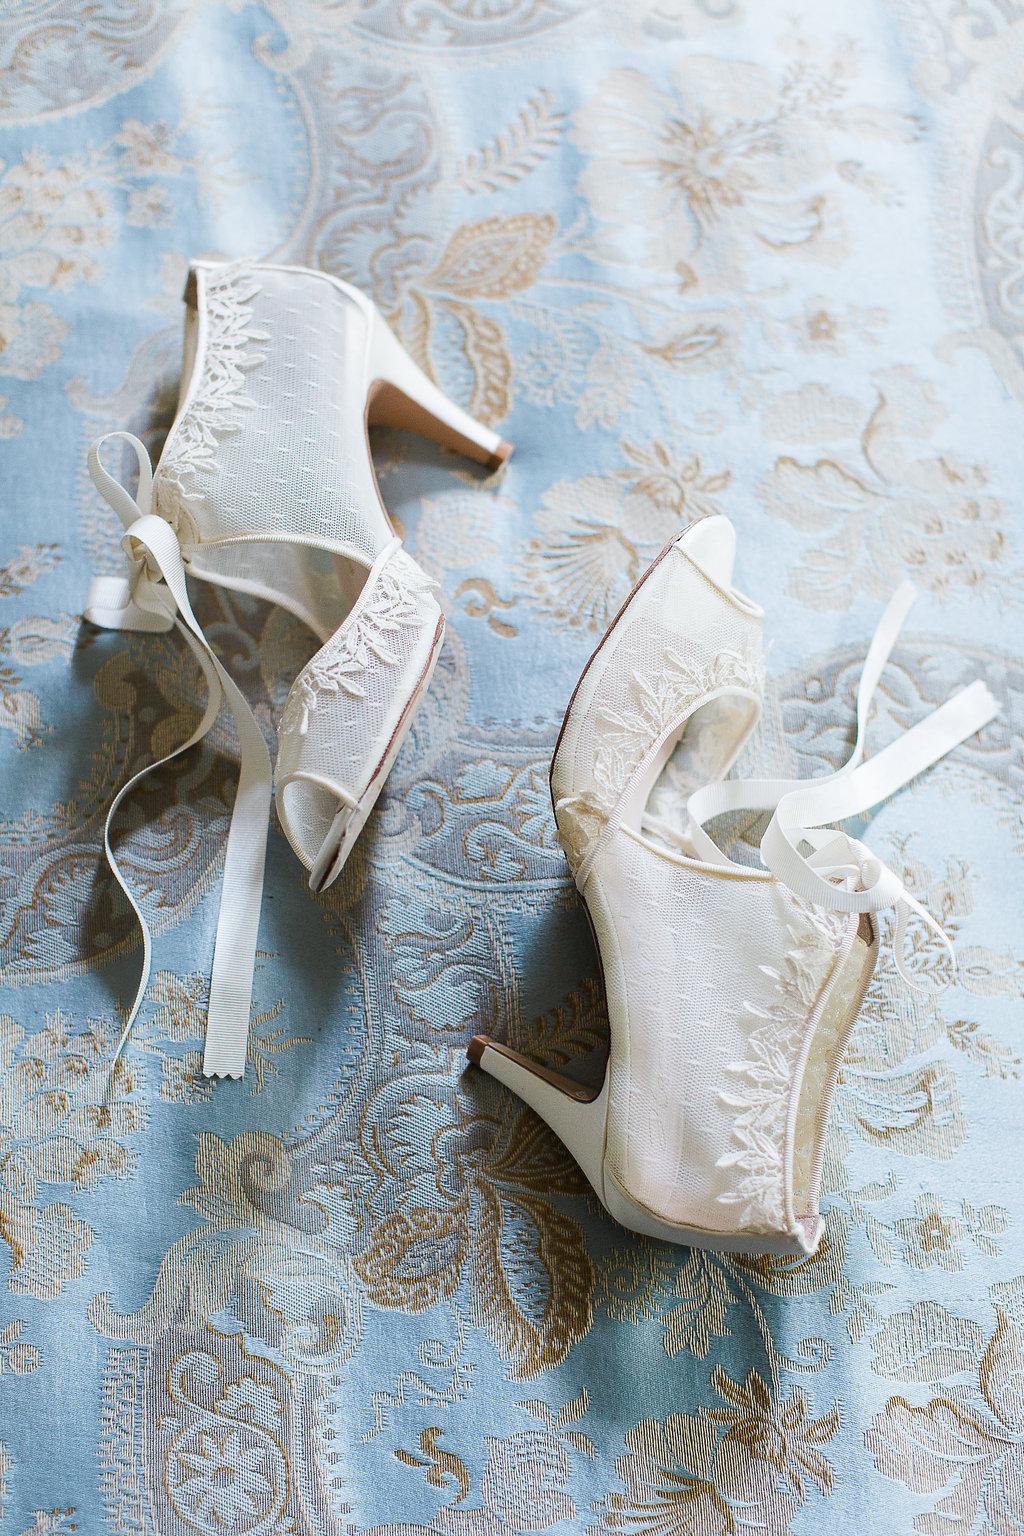 Verona-Destination-Wedding-Inspiration-by-Kibogo-Photography26.jpg